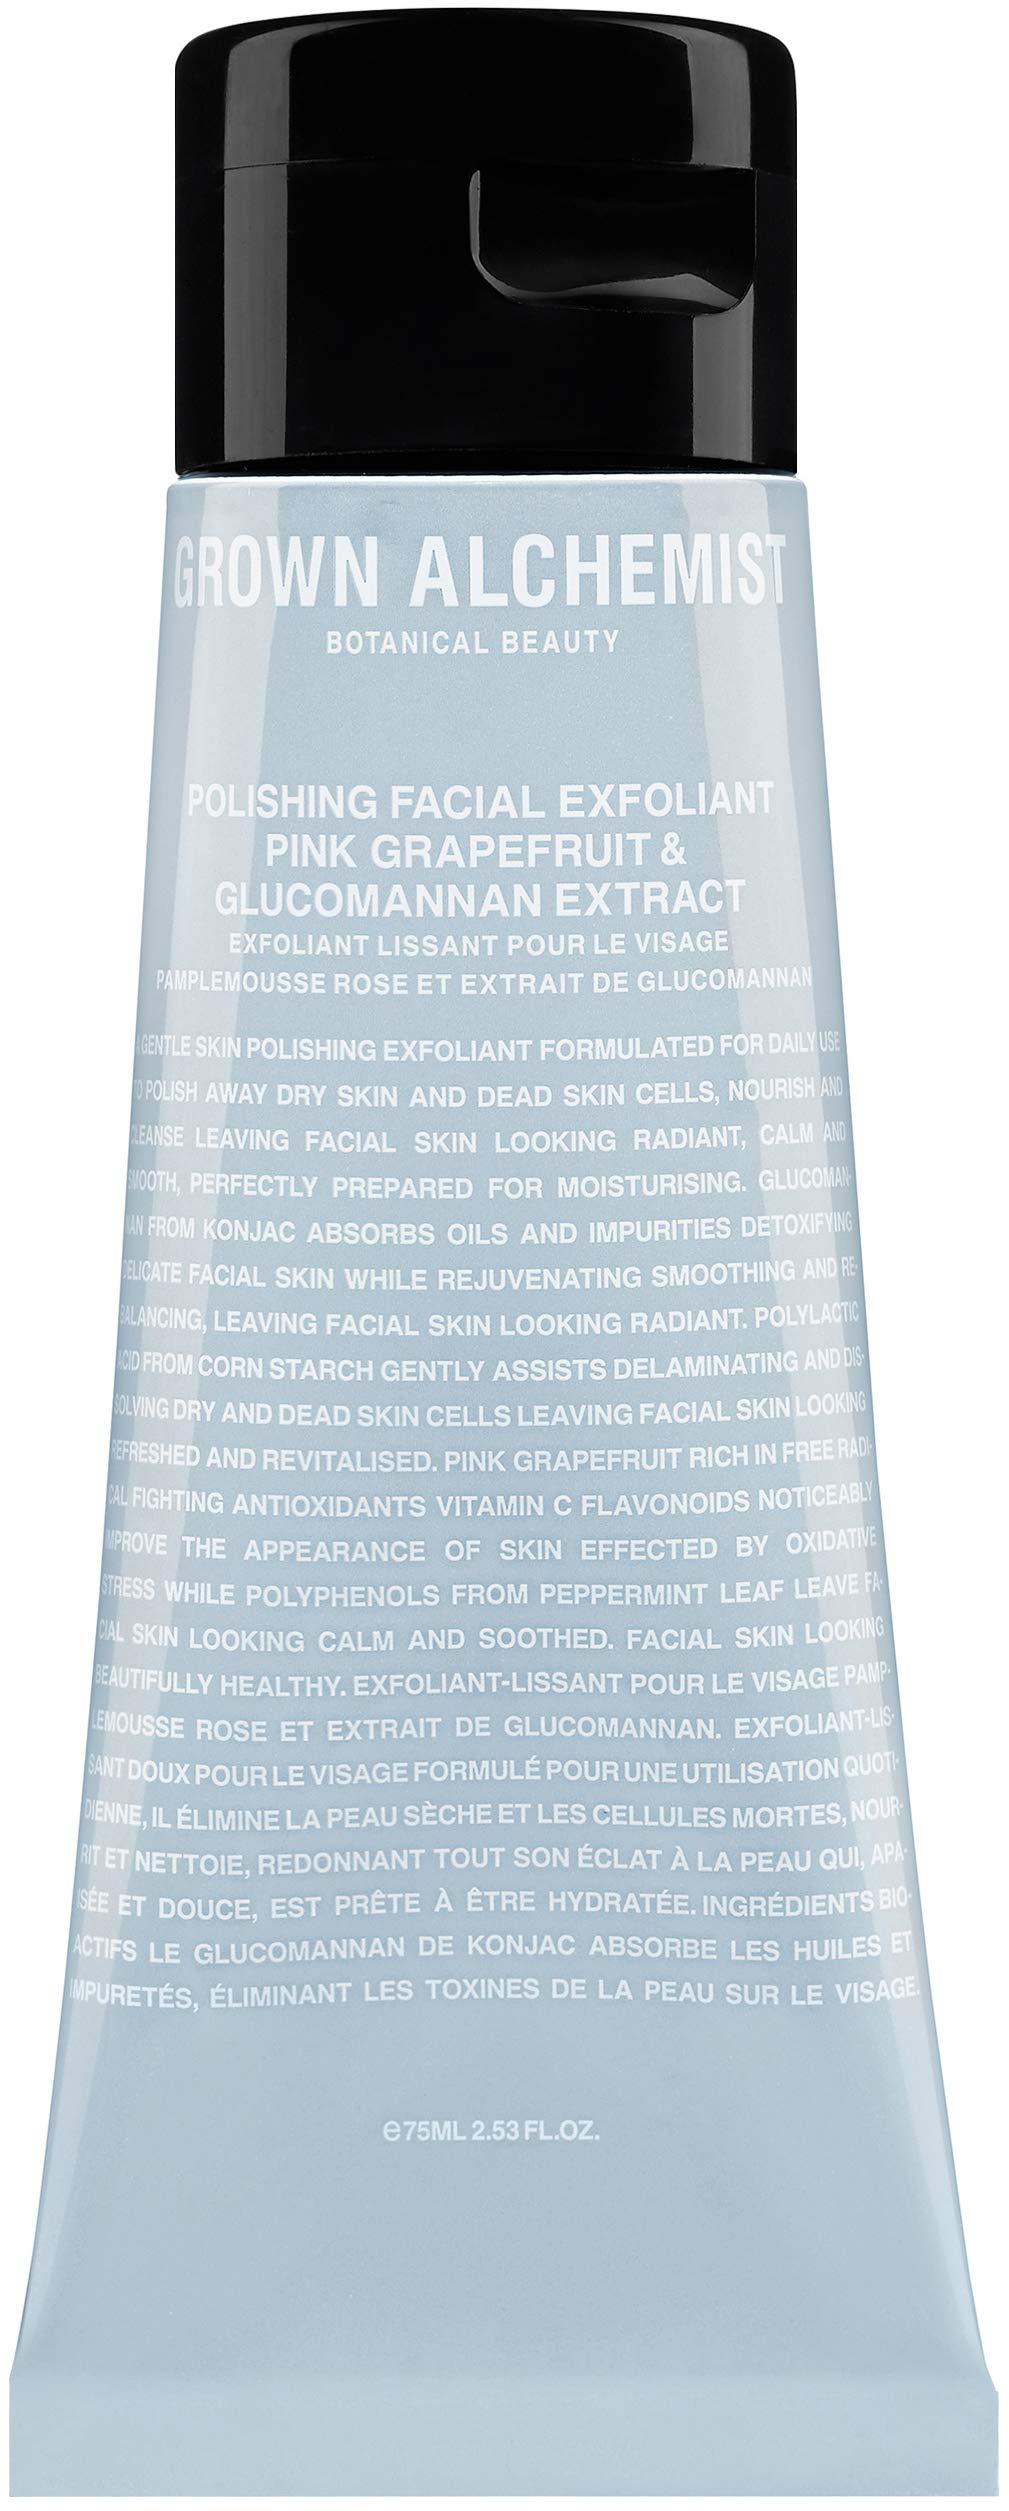 Grown Alchemist Polishing Facial Exfoliant - Pink Grapefruit & Glucomannan Extract (75ml / 2.53oz) by Grown Alchemist